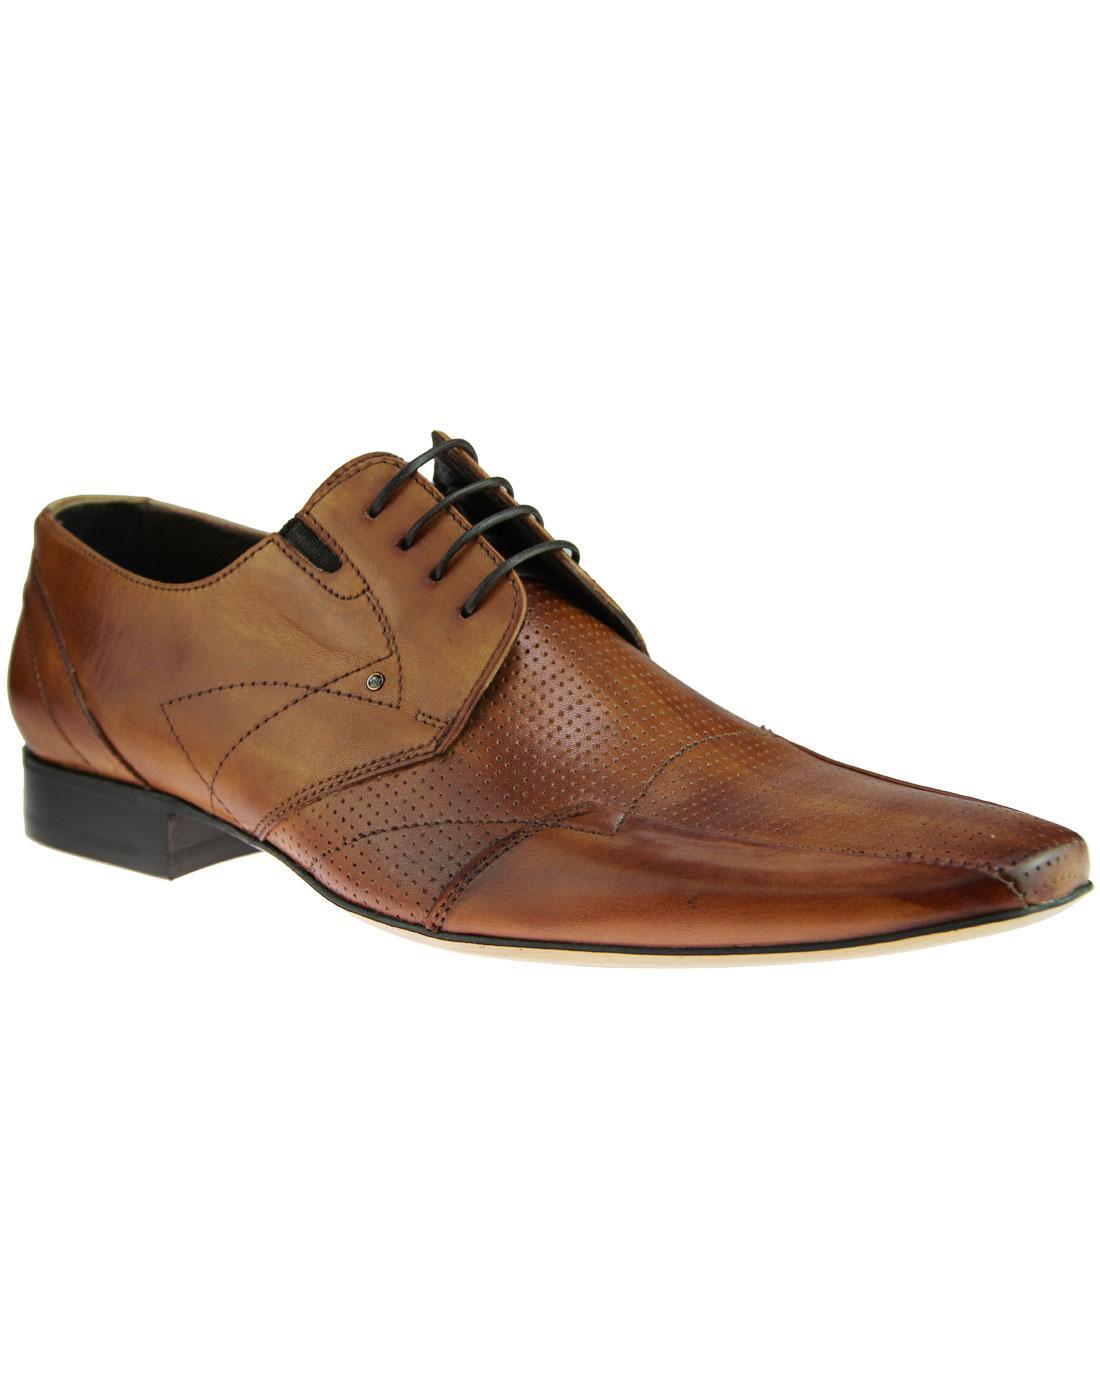 LACUZZO Retro Swarovski Blue Crystal Derby Shoes